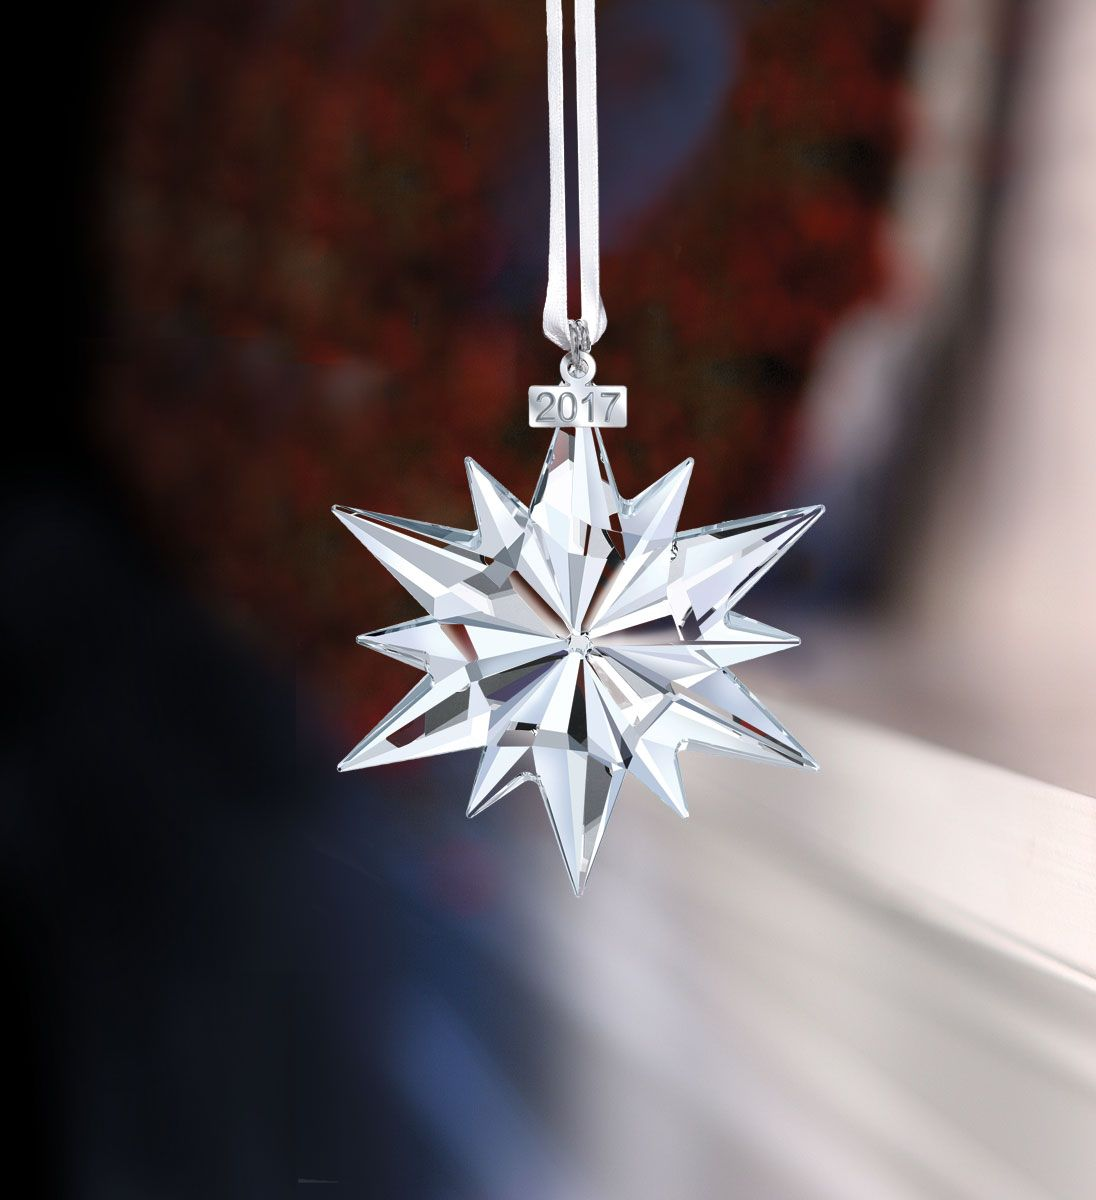 6f3b3bdba Swarovski Crystal, Annual Edition 2017 Crystal Christmas Ornament ...